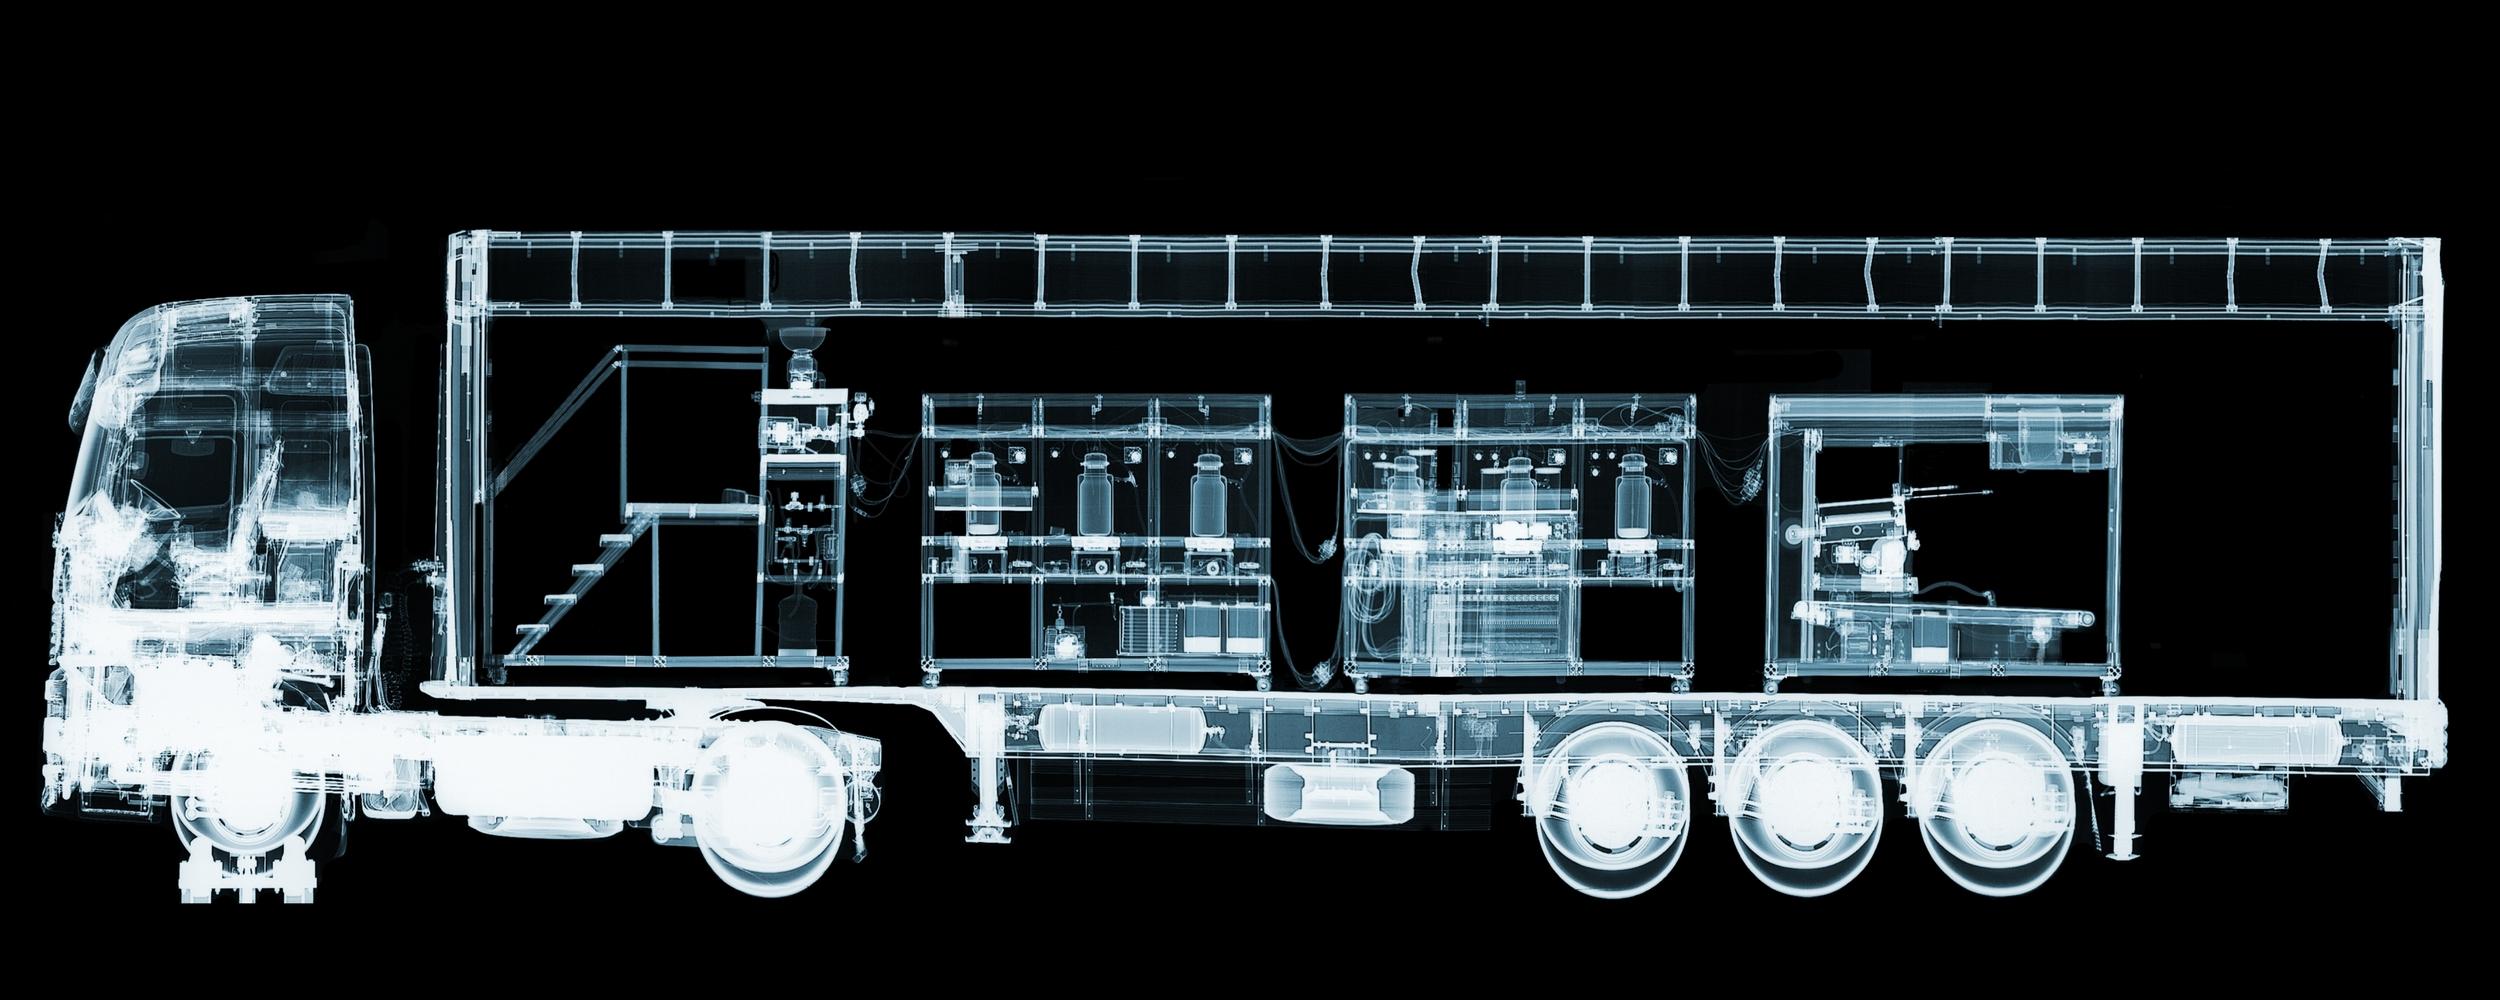 Wim Delvoye. Cloaca x-rayed truck (Black) , 2000.